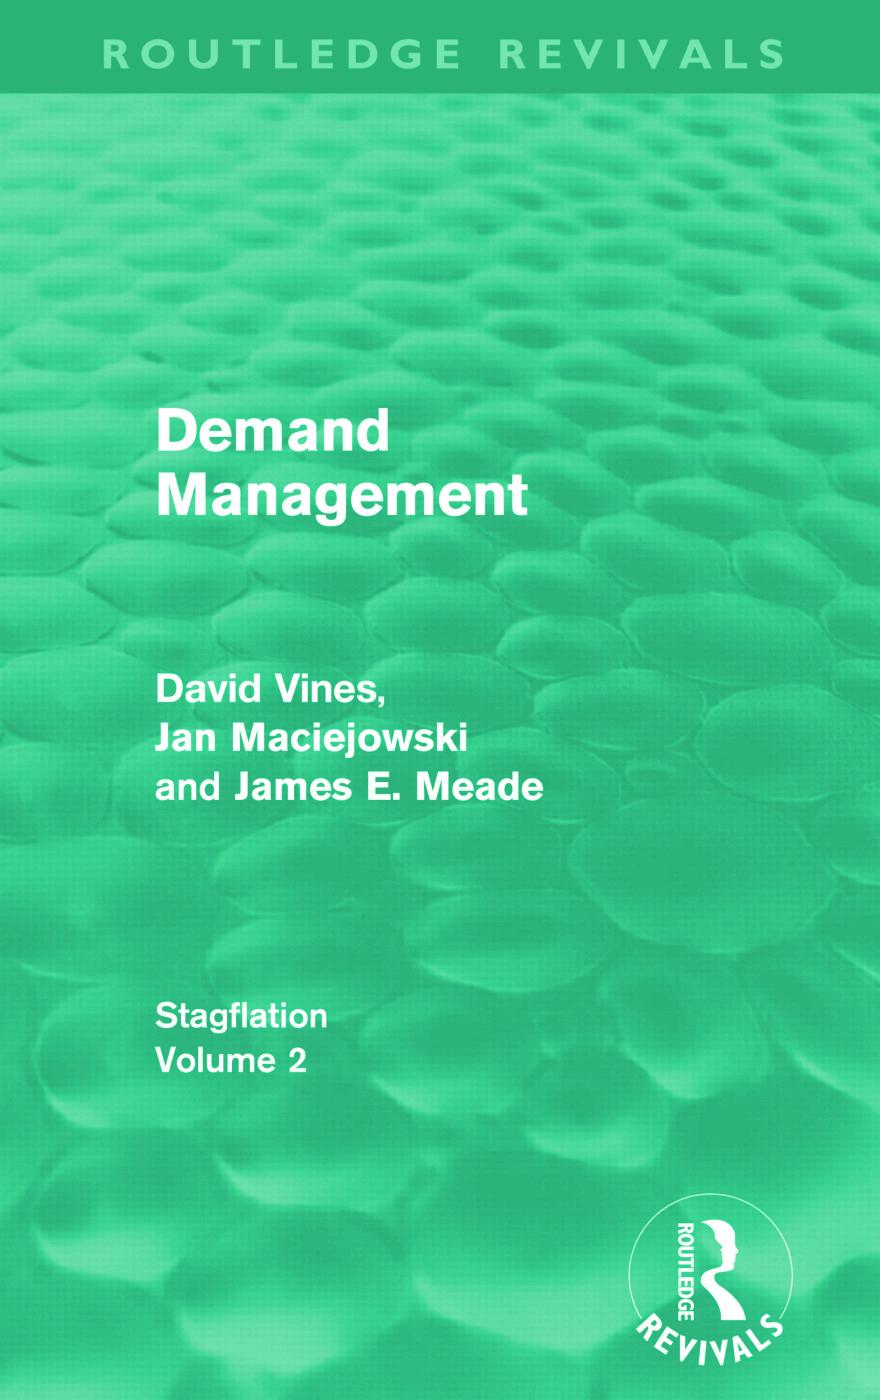 Demand Management (Routledge Revivals): Stagflation - Volume 2 (Paperback) book cover